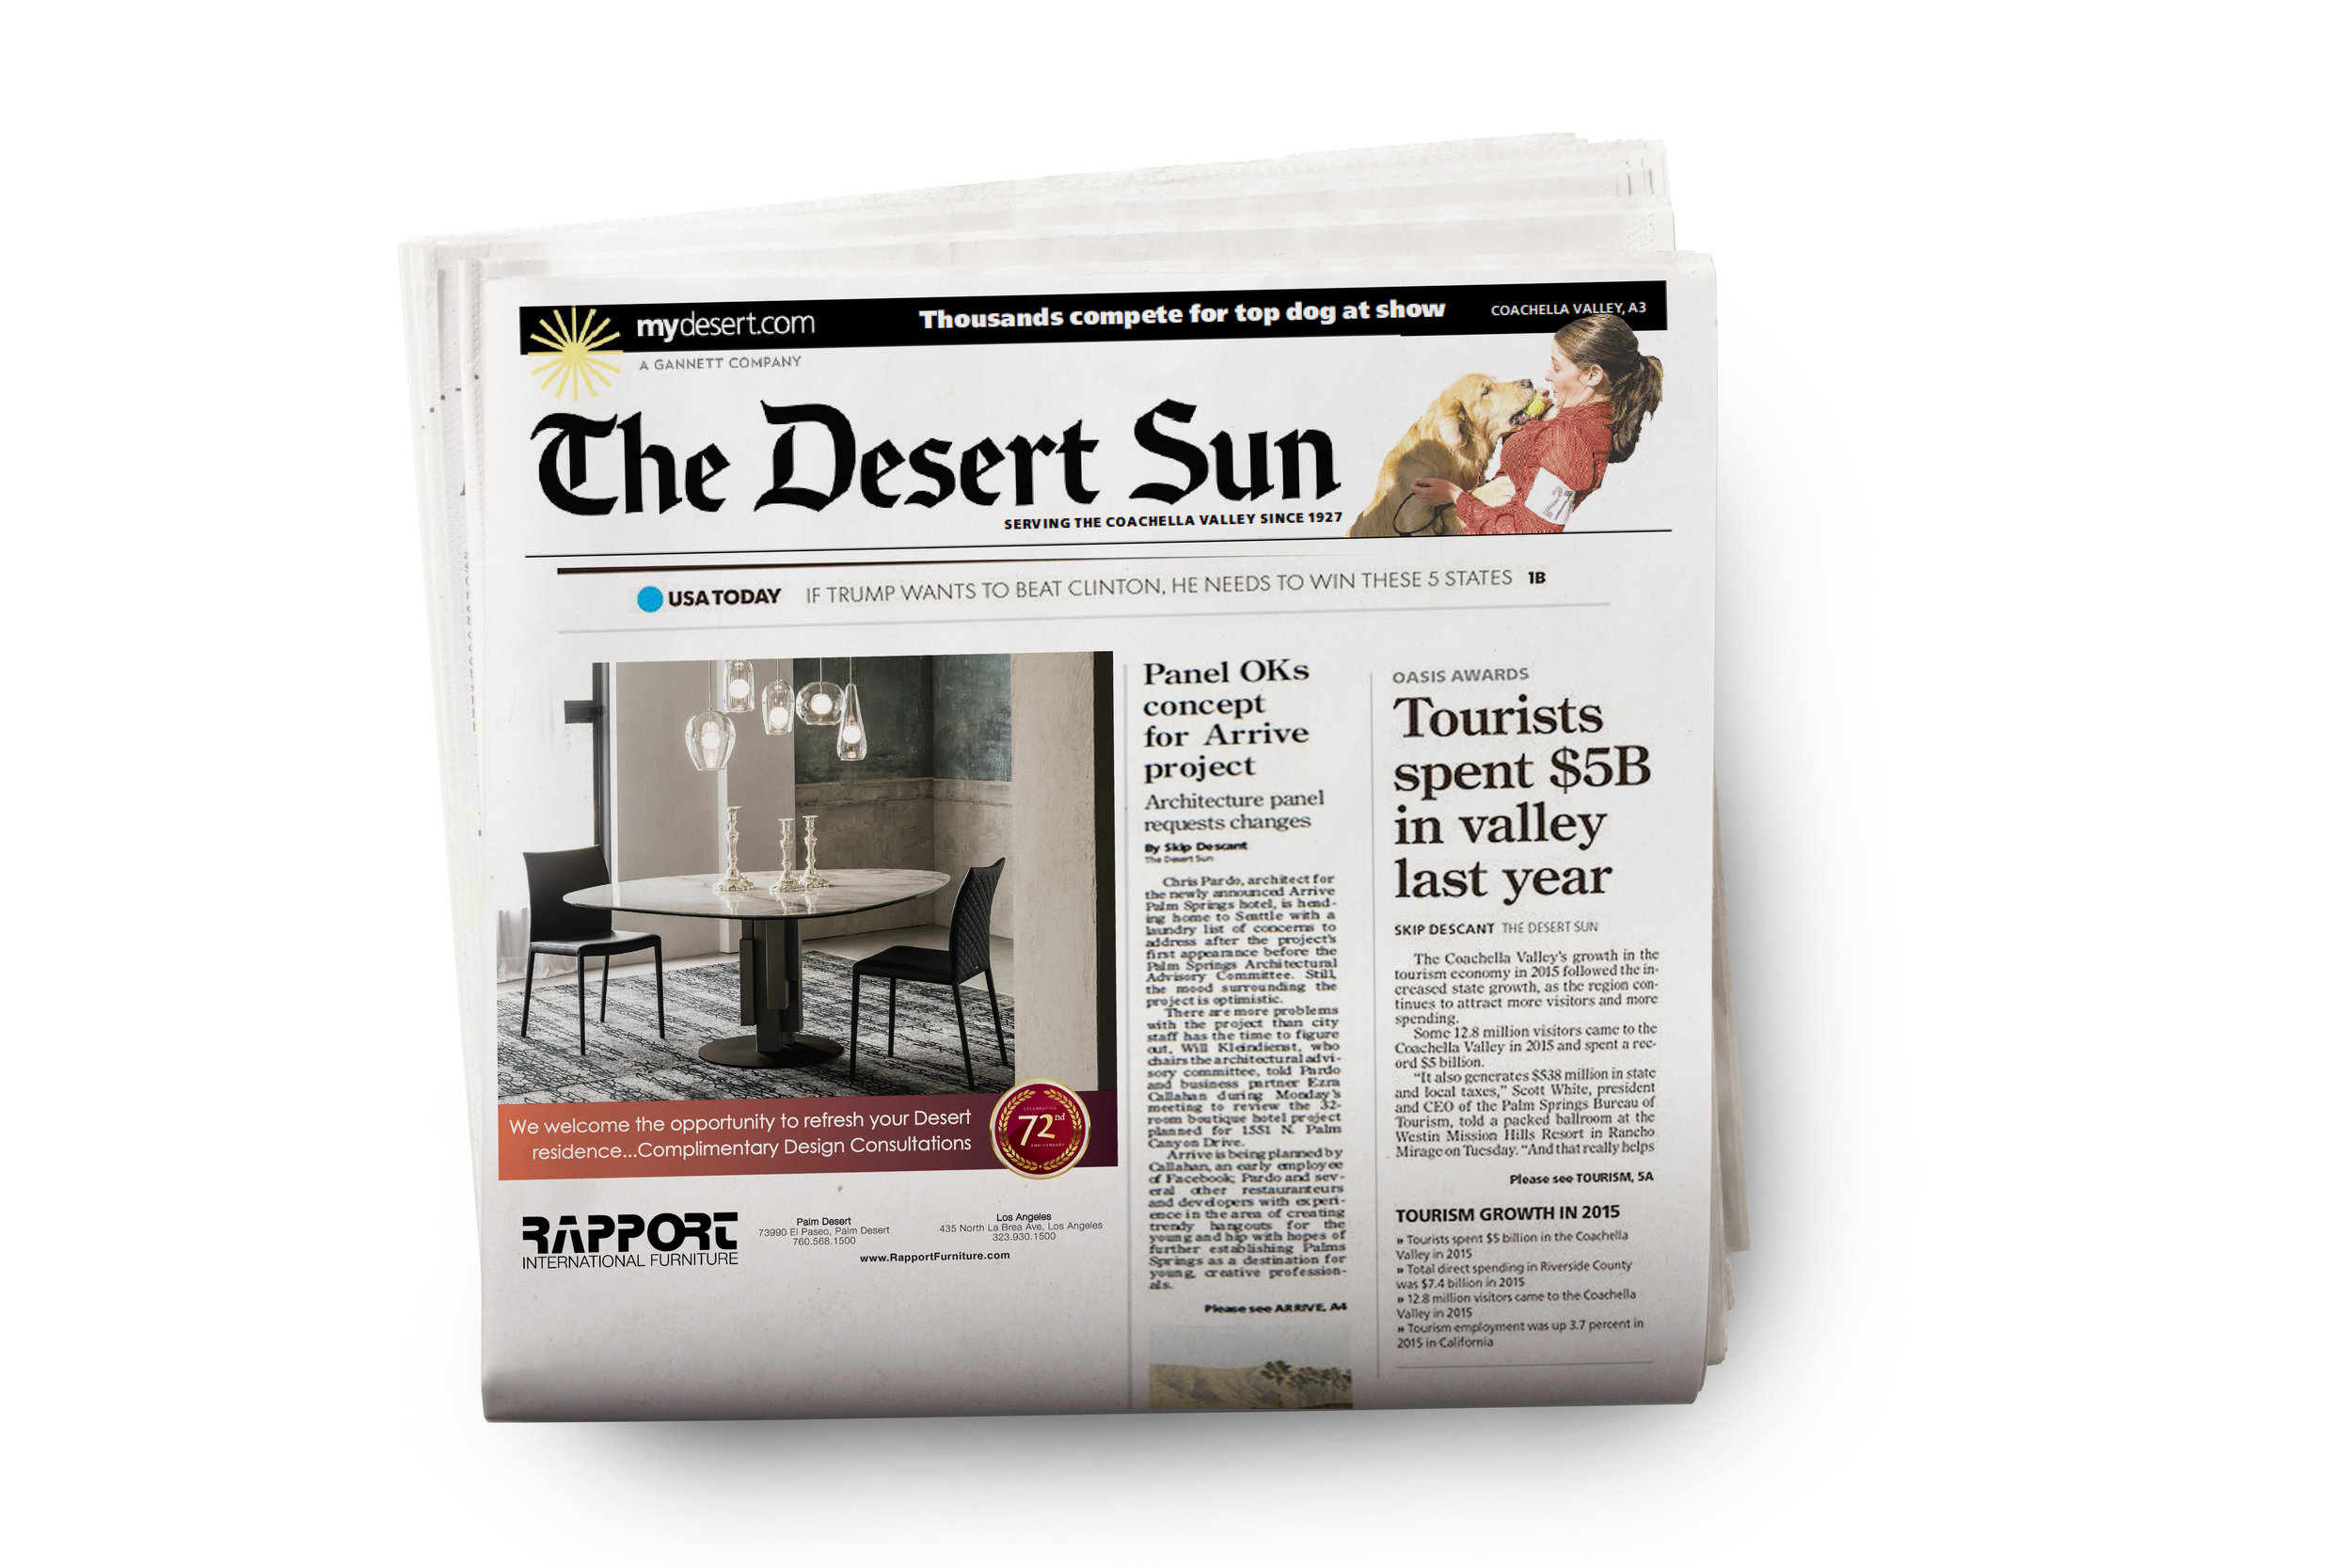 Rapport_DesertSunNewspaper_MOCKUP21.jpg